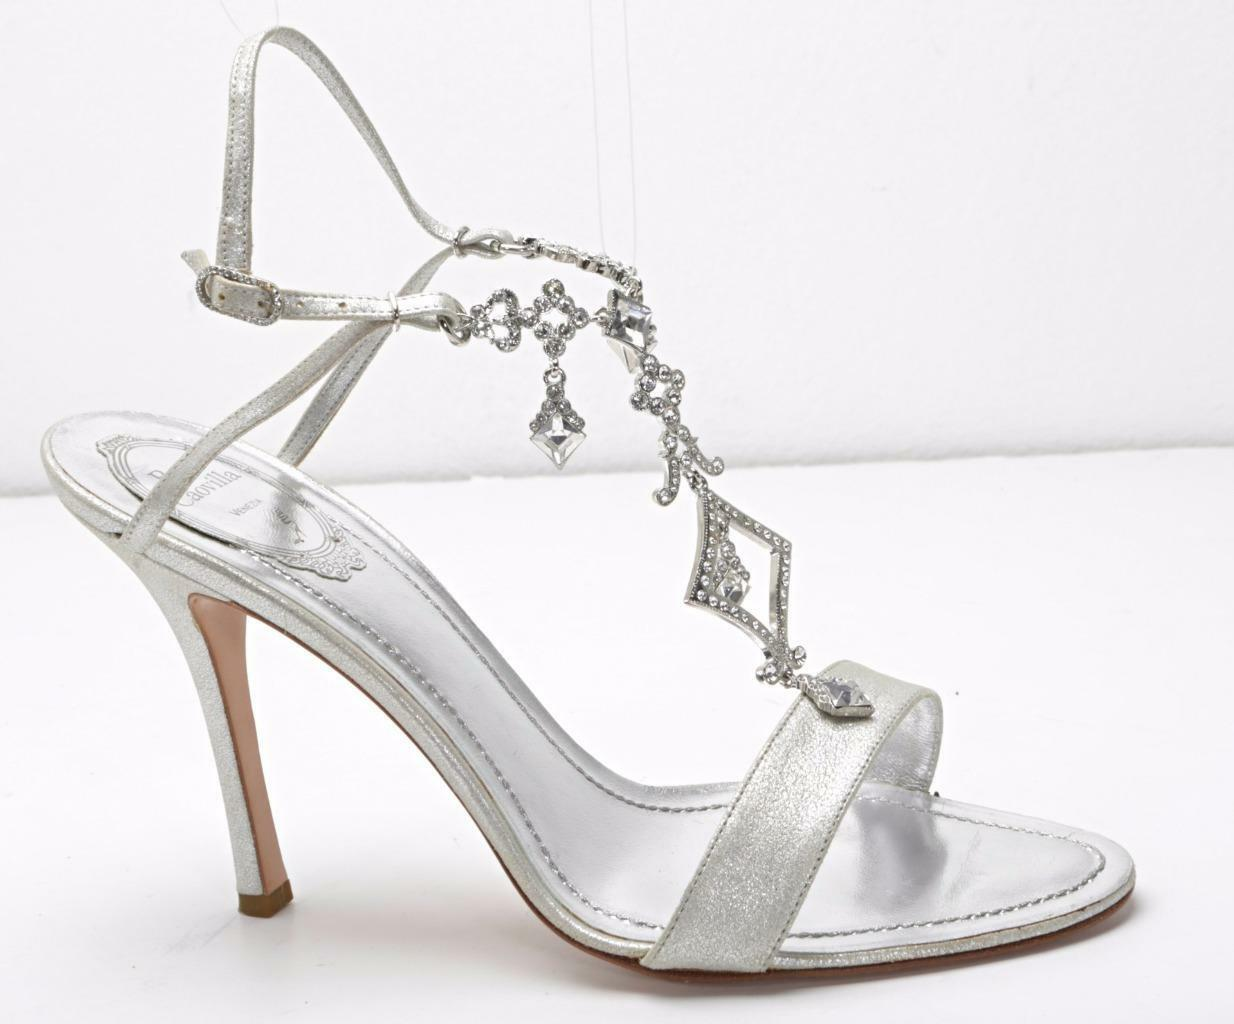 RENE CAOVILLA argent Leather High Heel Strappy Jeweled Sandal Pump Pump Pump 10-40 NEW 6b4691